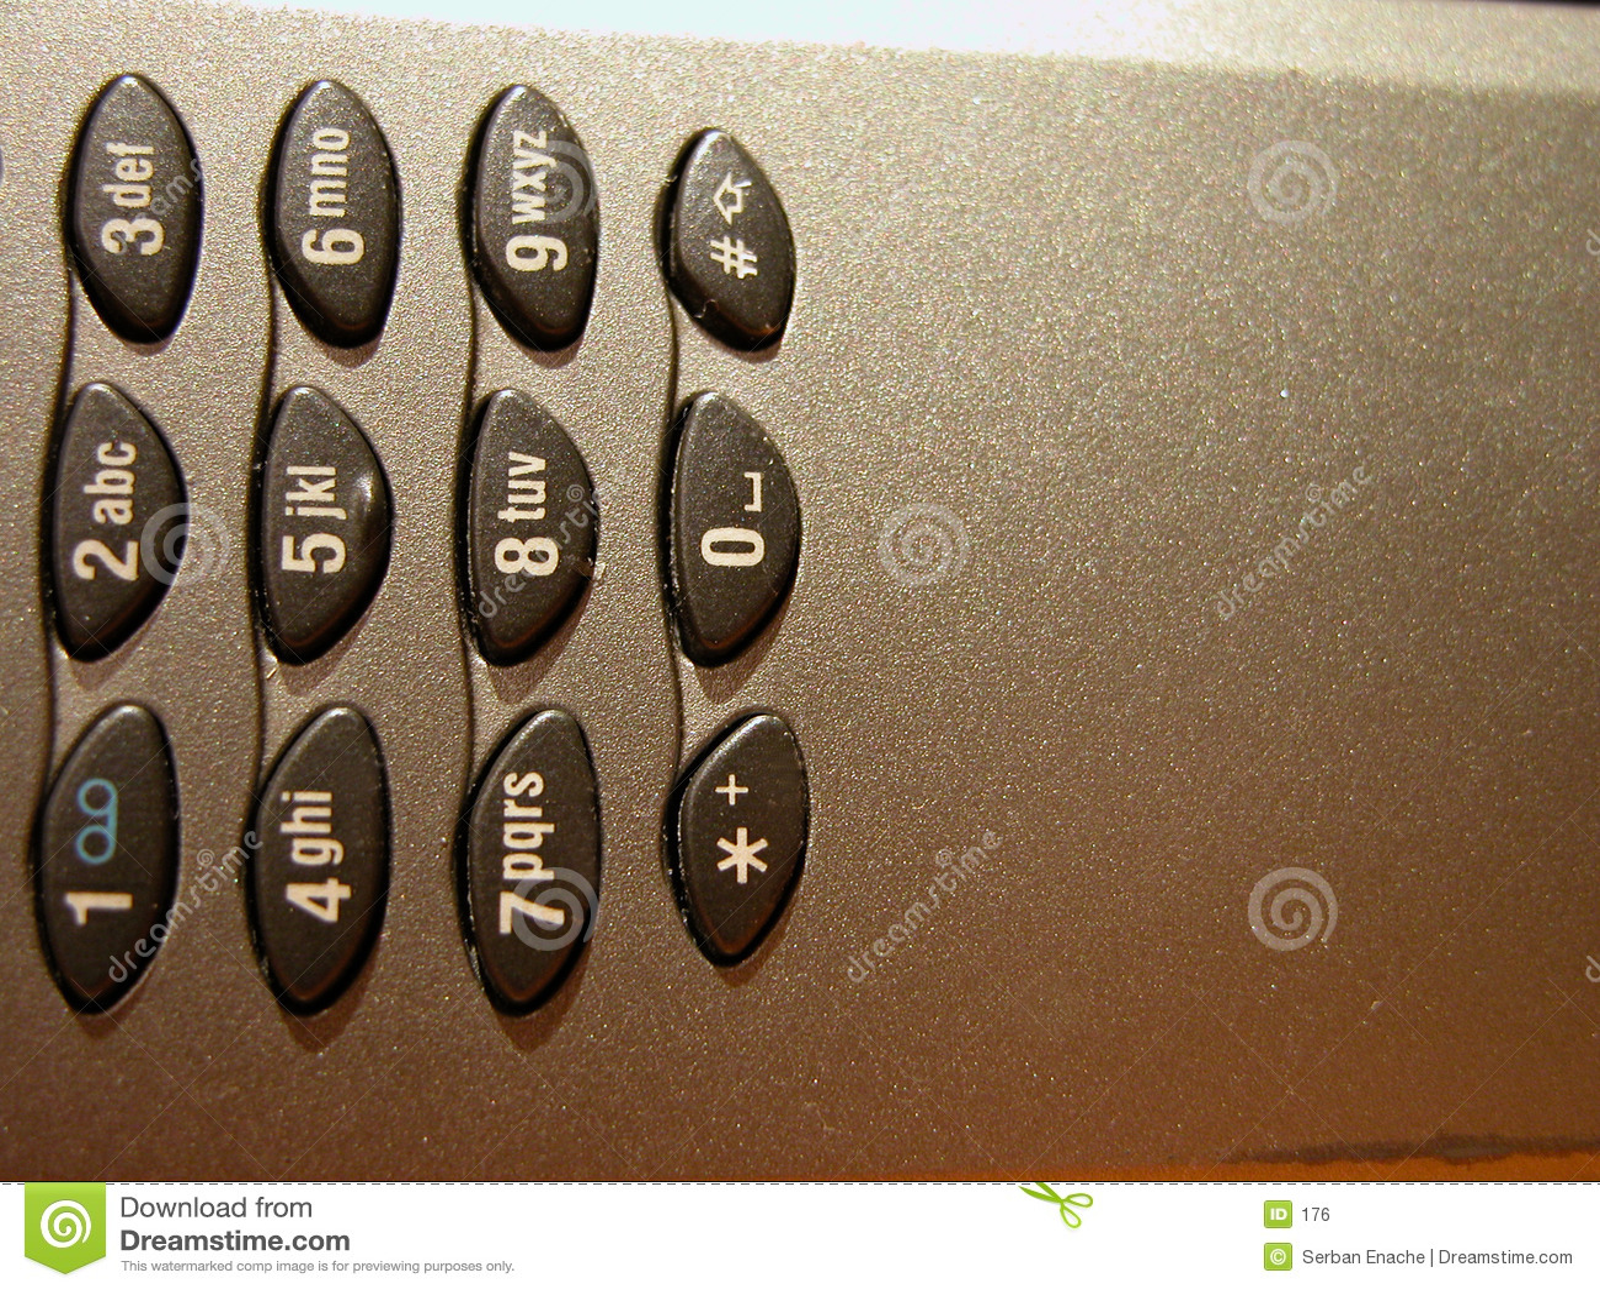 Telefone móvel - detalhe 2